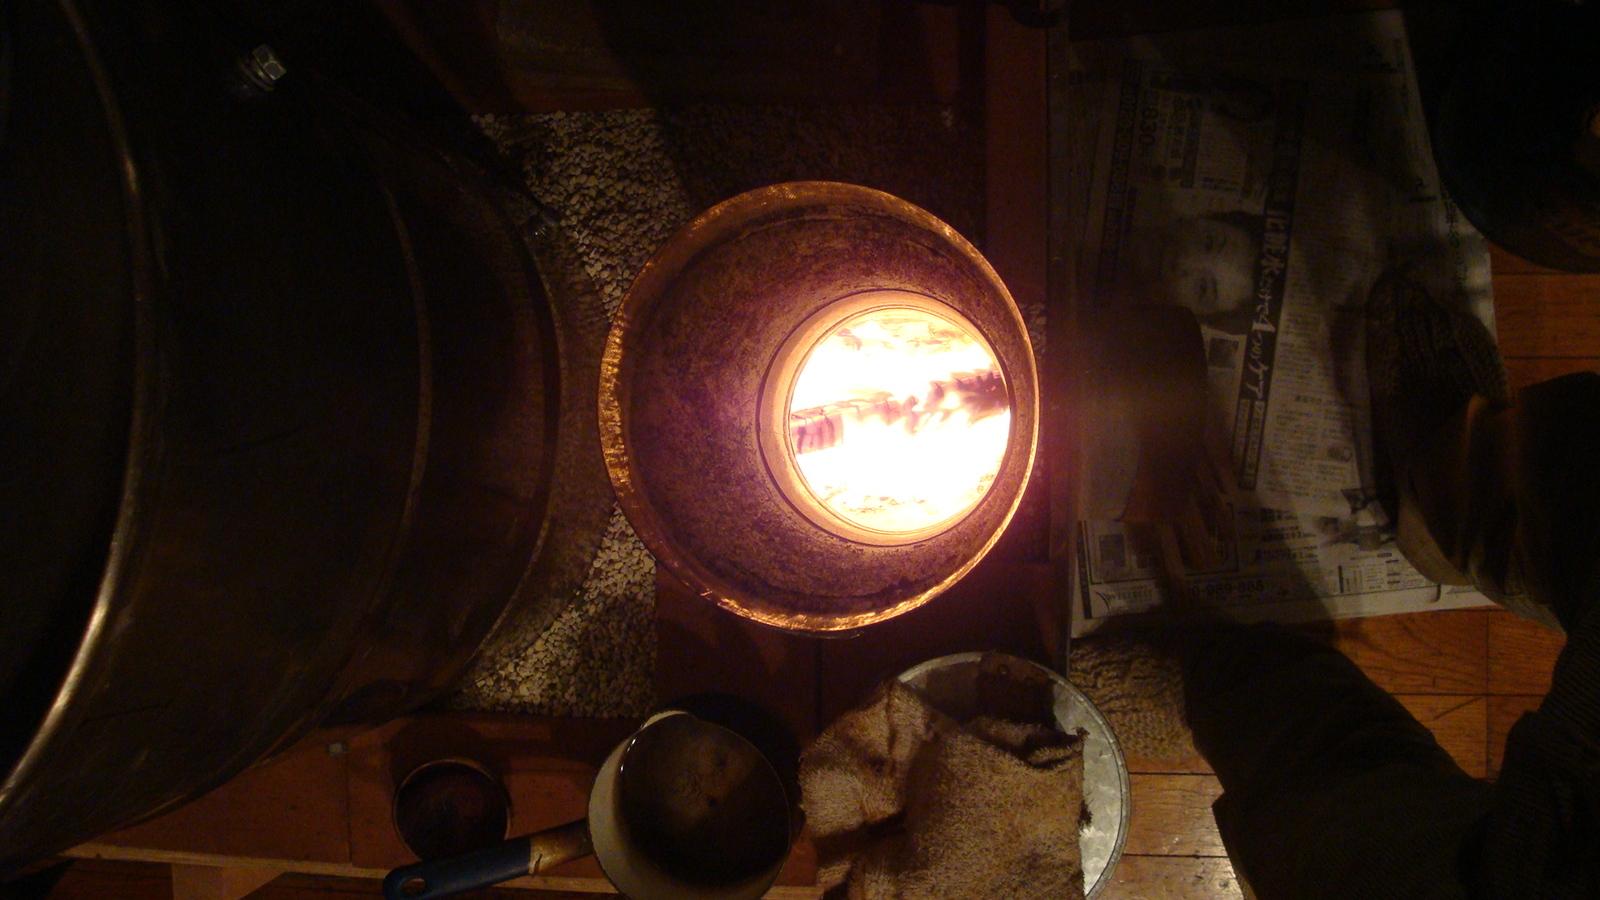 Rocket_stove2_010